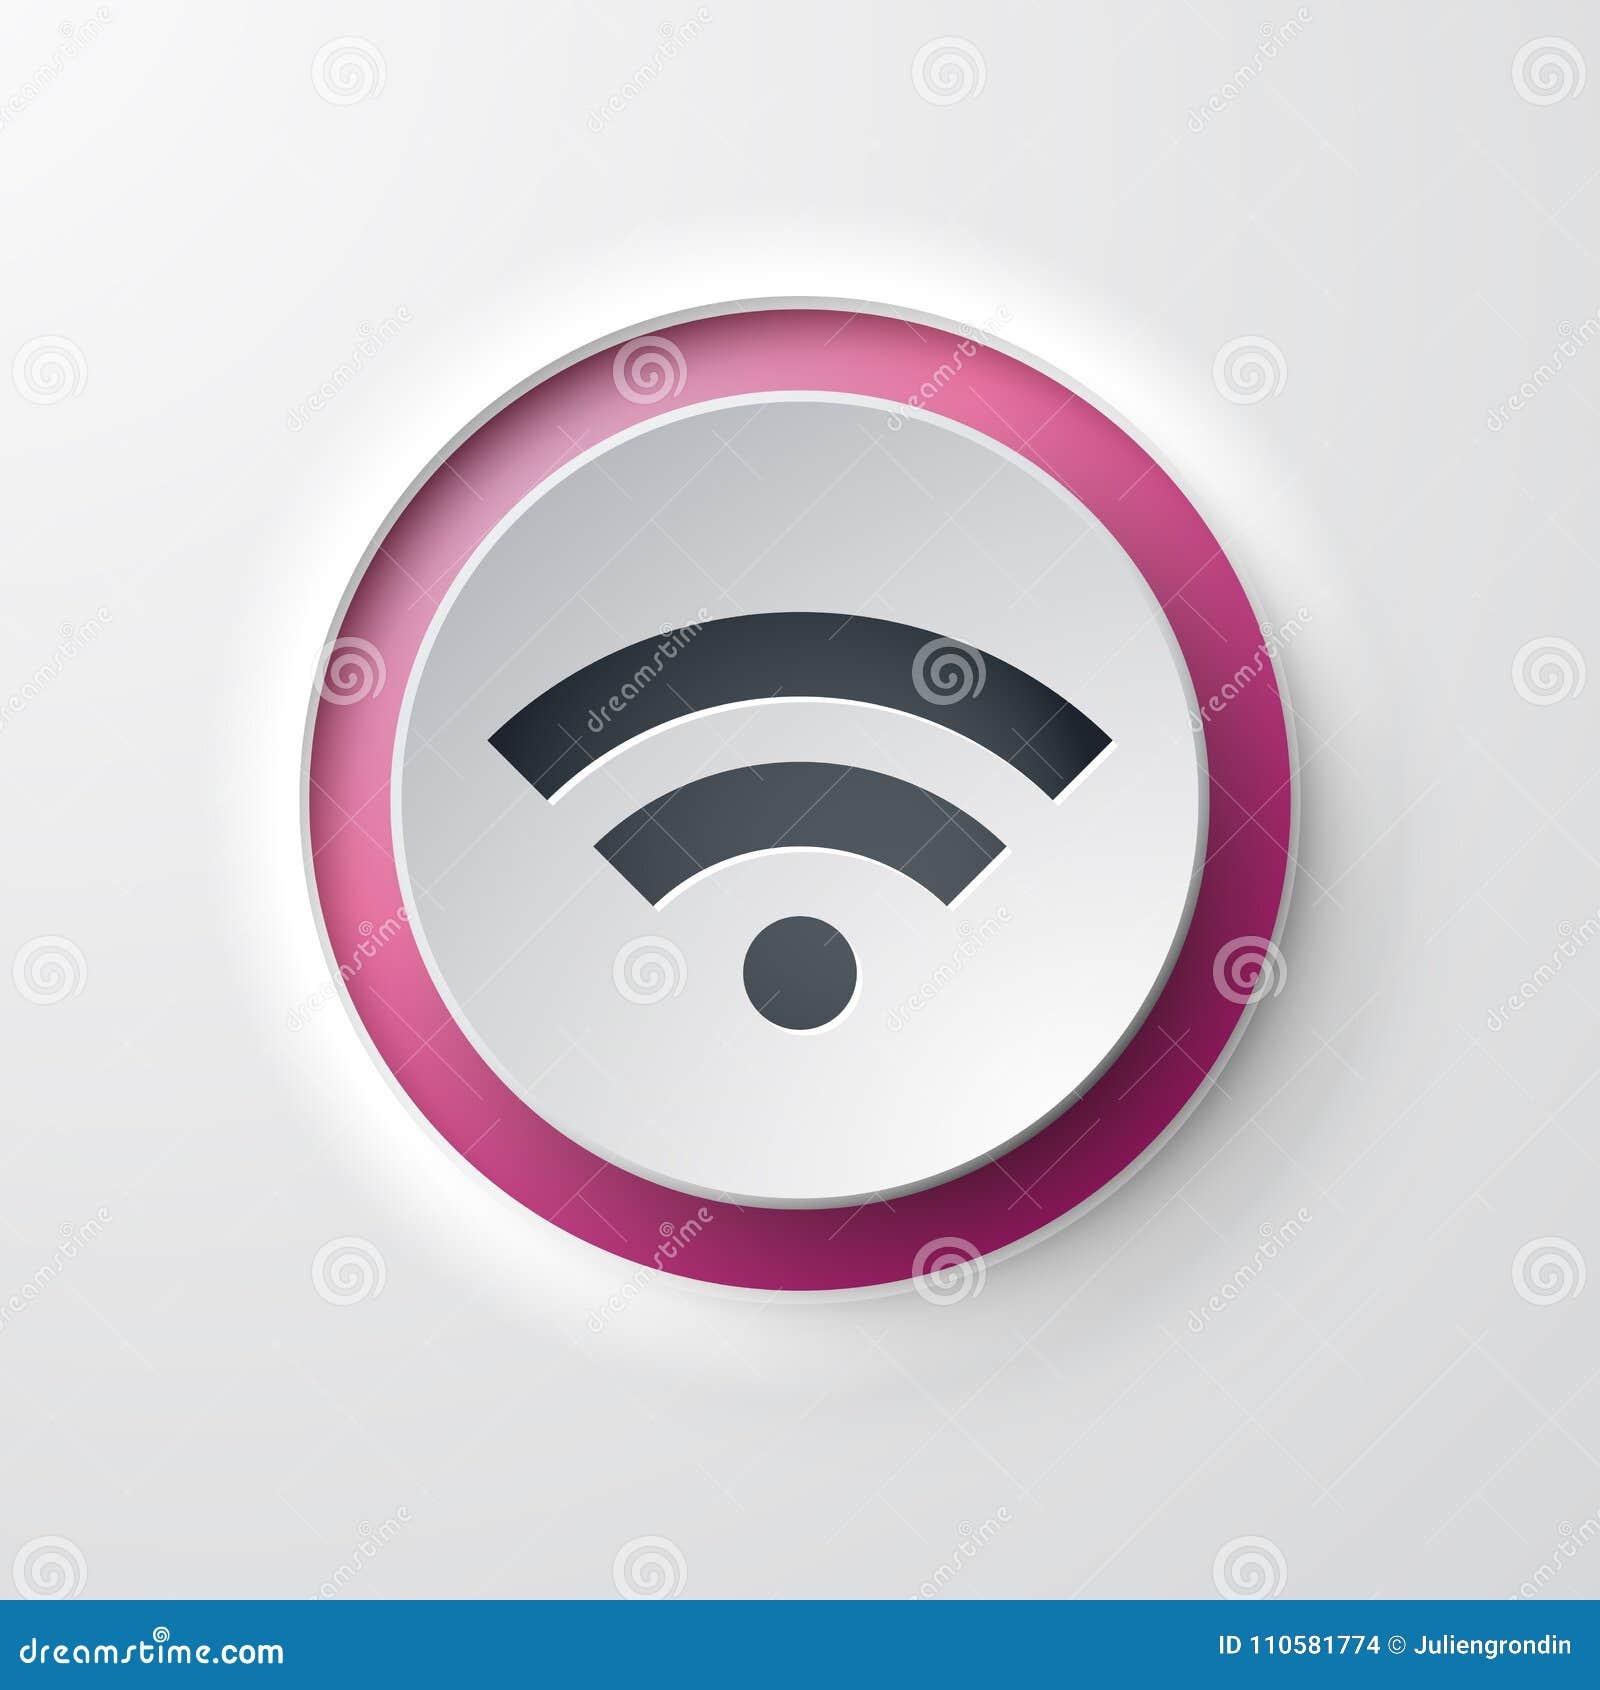 Web icon push-button wifi stock illustration  Illustration of clean